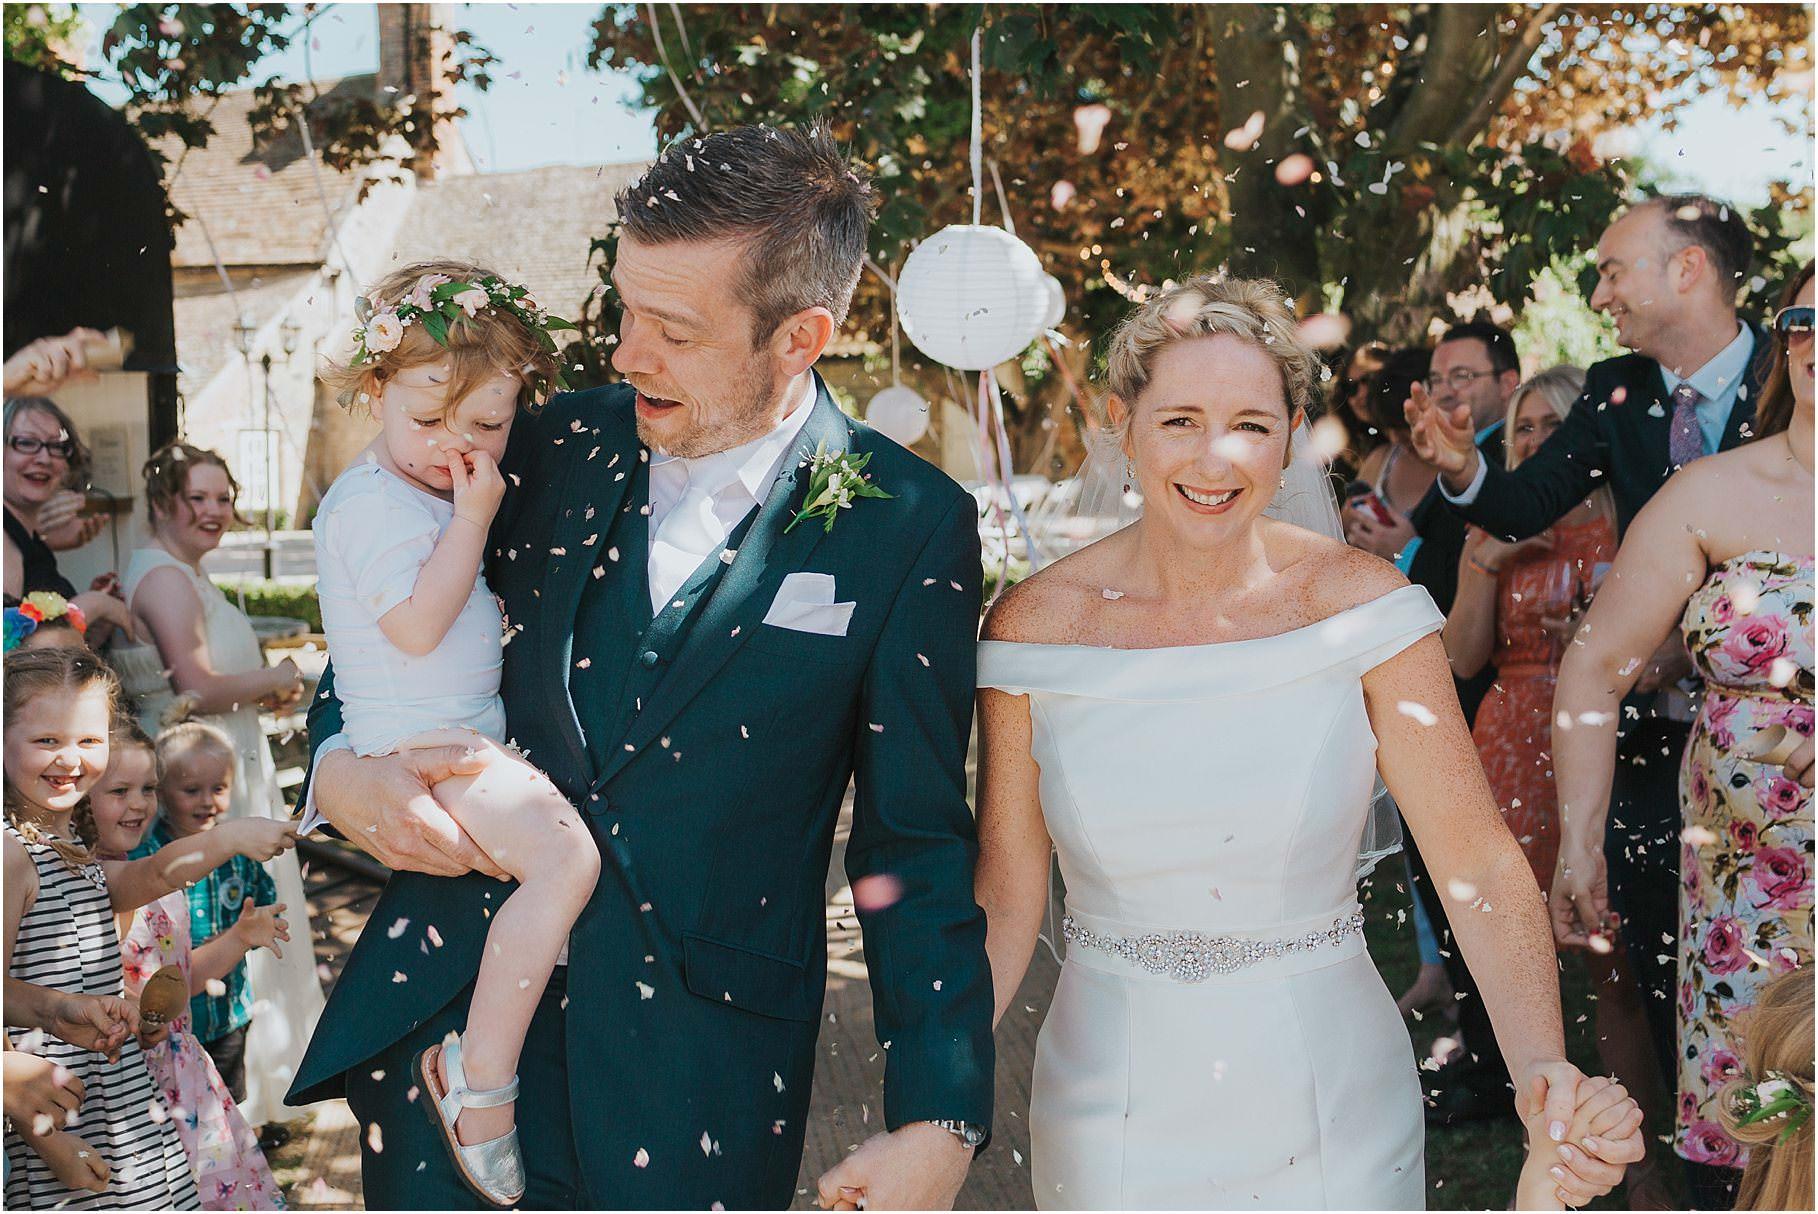 Cambridgeshire Wedding Photographer Black Horse Elton Wedding 1045 - Mr and Mrs Mac // CAMBRIDGESHIRE WEDDING